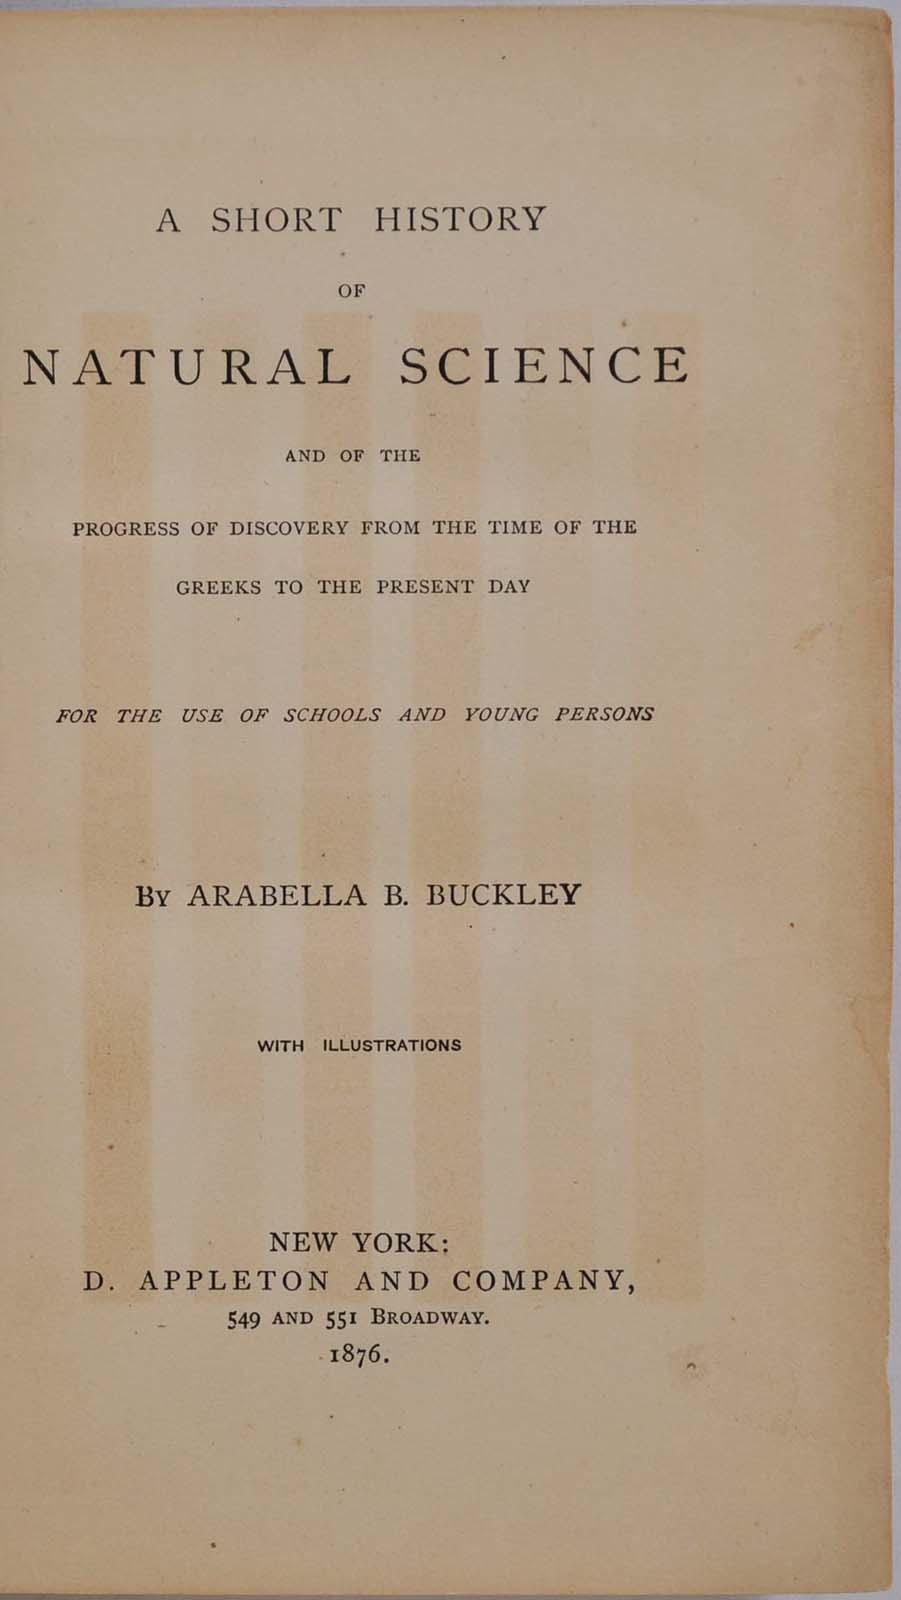 A Short History of Natural Science book image